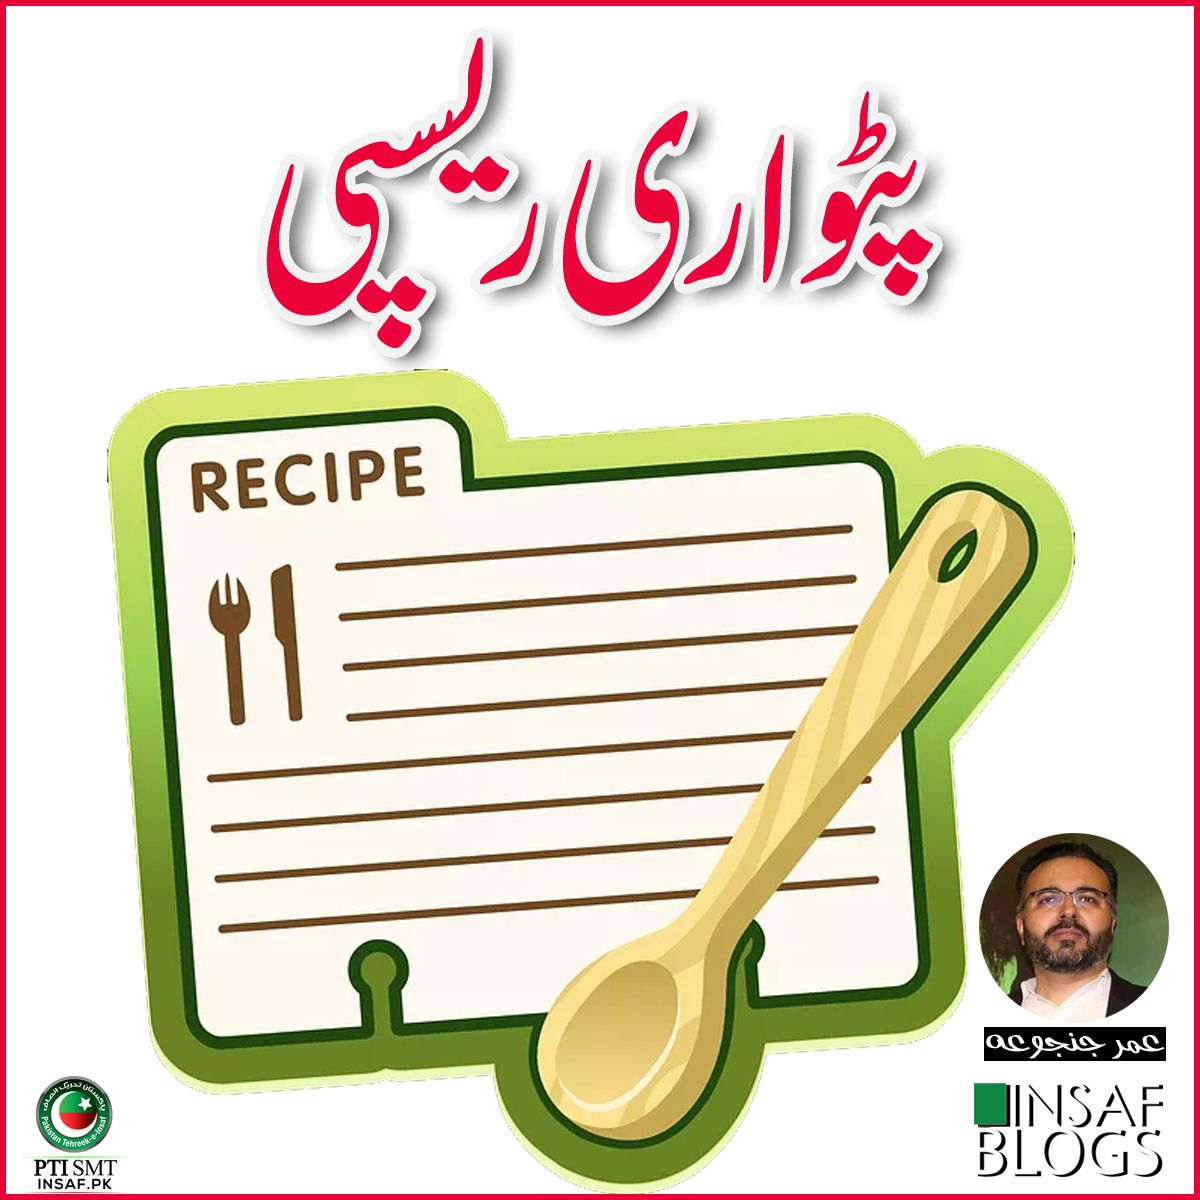 Patwari-recipe-insaf-blog